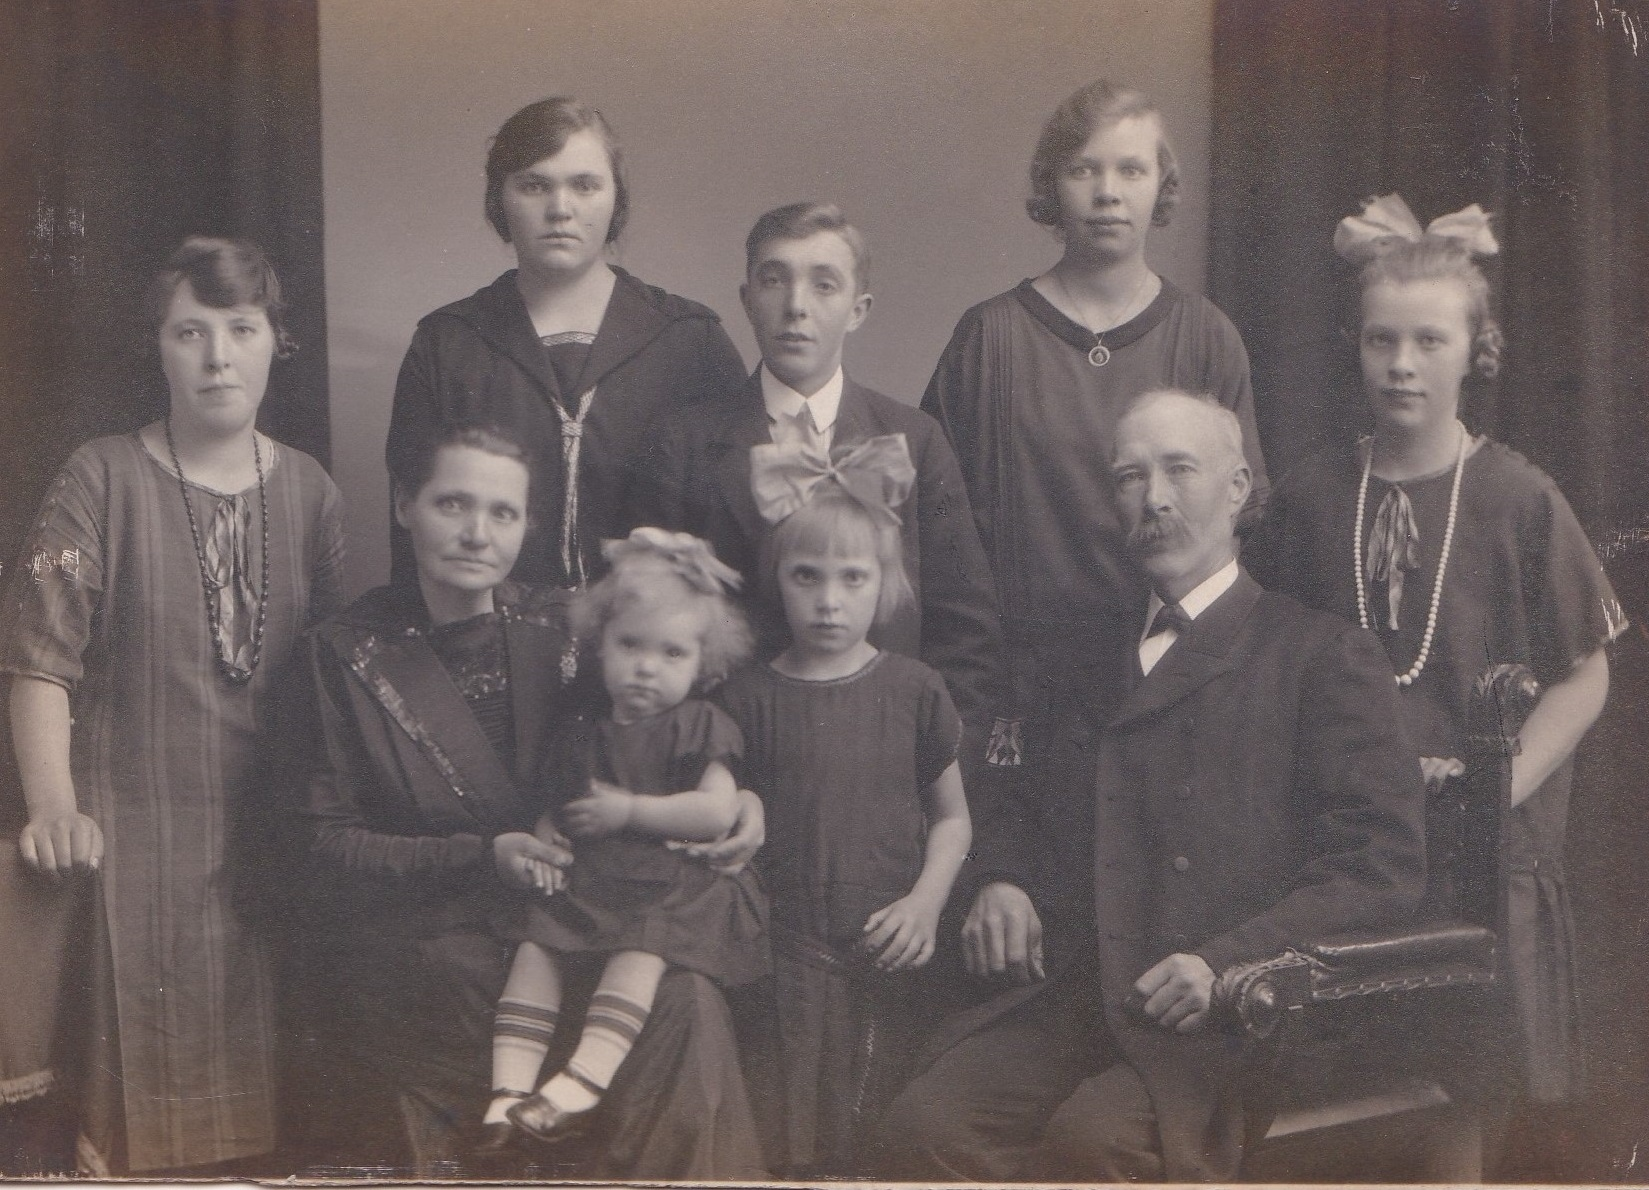 Johannes Nielsen (1871-1950) fotograferet med sin hustru Ane Kirstine (f. Steffensen, 1882-1938) og deres syv børn. Stående fra venstre Edith (g. Bjerregaard, 1911-1984), Anine Kirstine Marie (g. Mikkelsen, 1907-1997), Kristen Arnold Nielsen (1908-1991) og Kirstine Alexandrine (g. Lauritsen, 1910-1952) og Agnes Mary Nielsen (f. 1913). Forrest i midten lille Inga Margrethe Nielsen (f. 1924) og Gerda (g. Poulsen, 1919-1989). Angiveligt 1926.